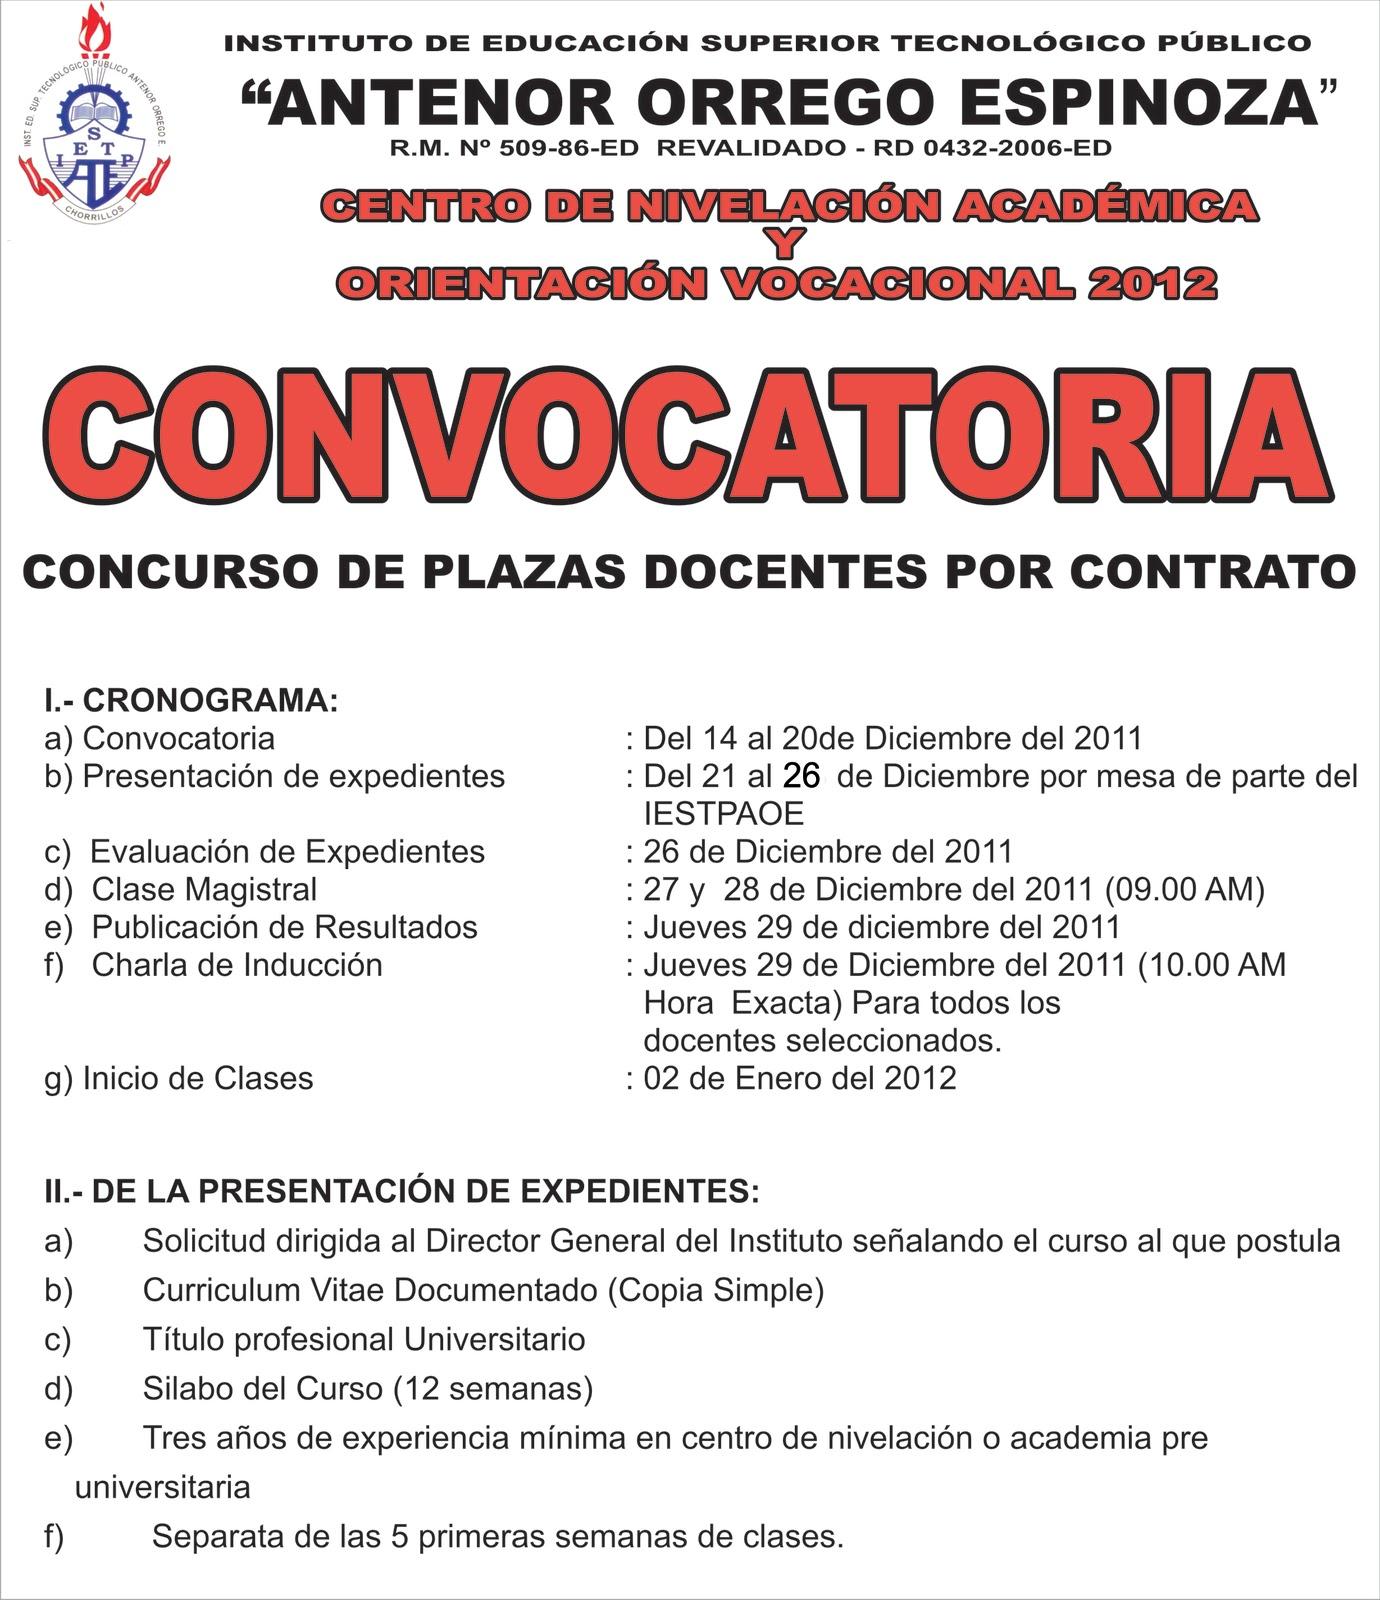 Instituto p blico antenor orrego espinoza convocatoria for Convocatoria de plazas docentes 2016